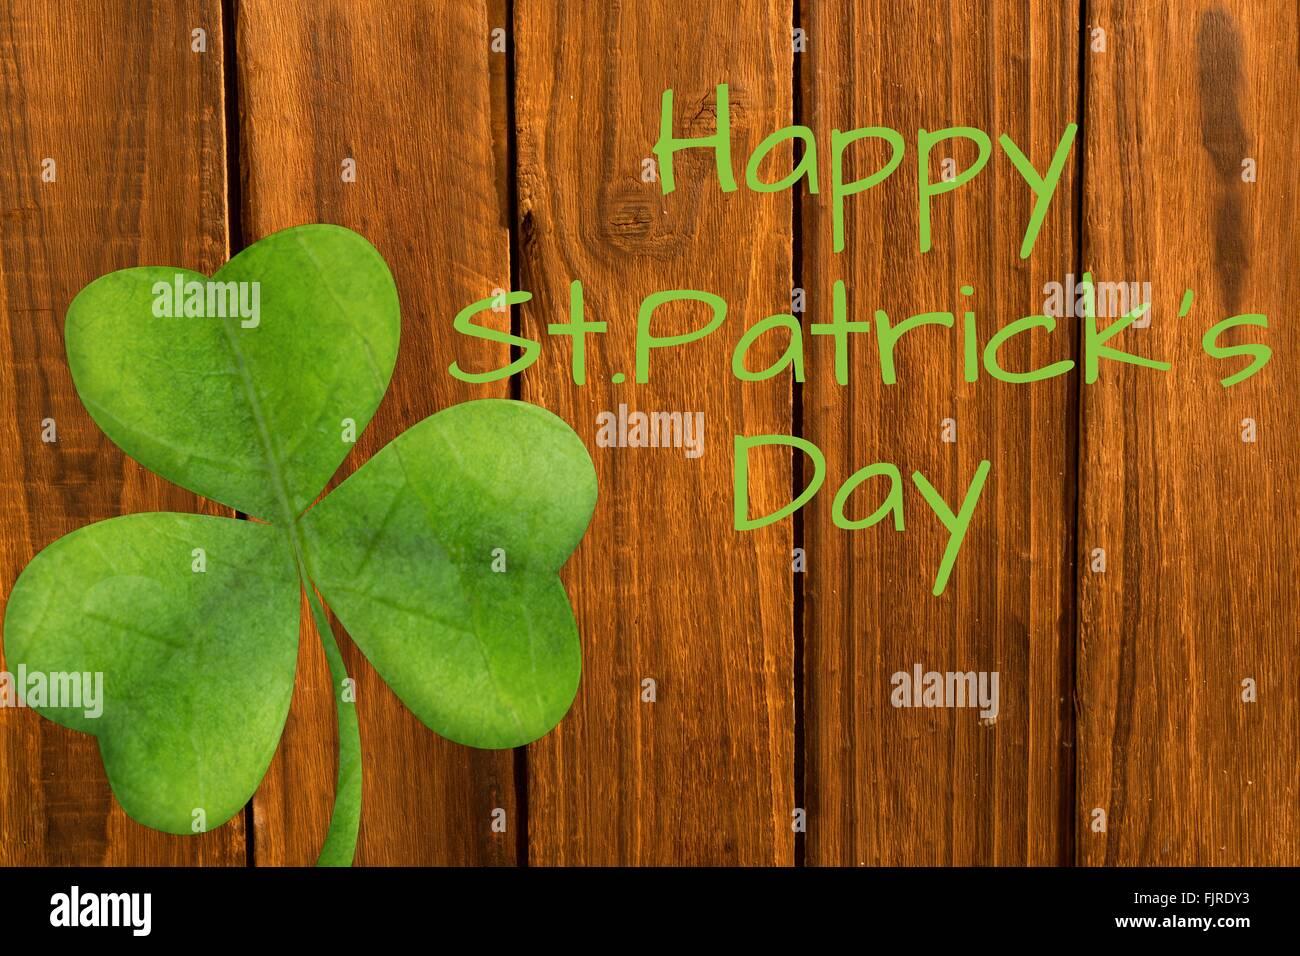 Happy st patricks day - Stock Image